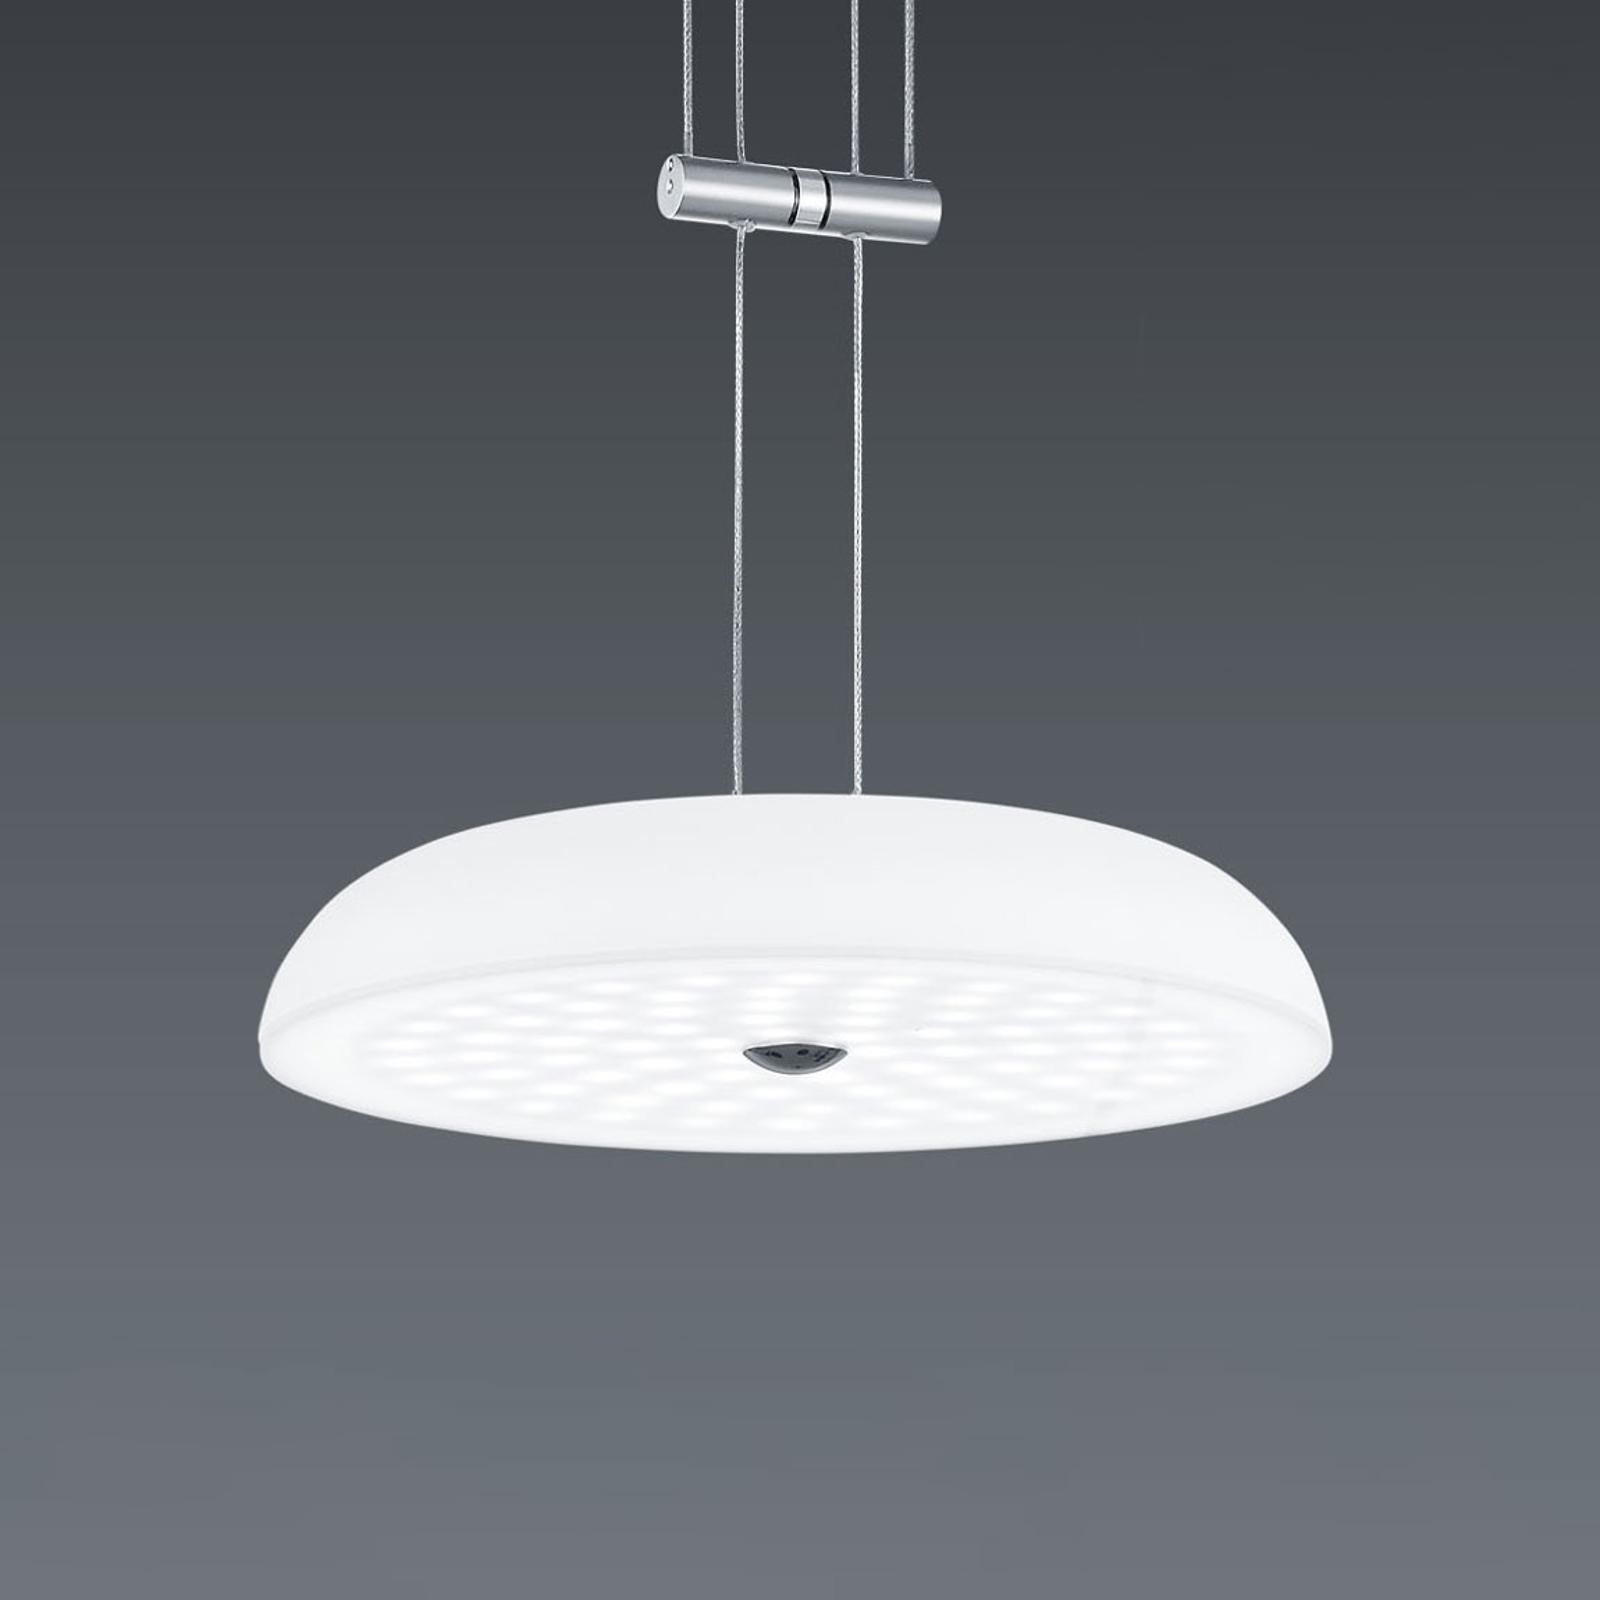 Acquista BANKAMP Vanity sospensione 1 luce, nichel